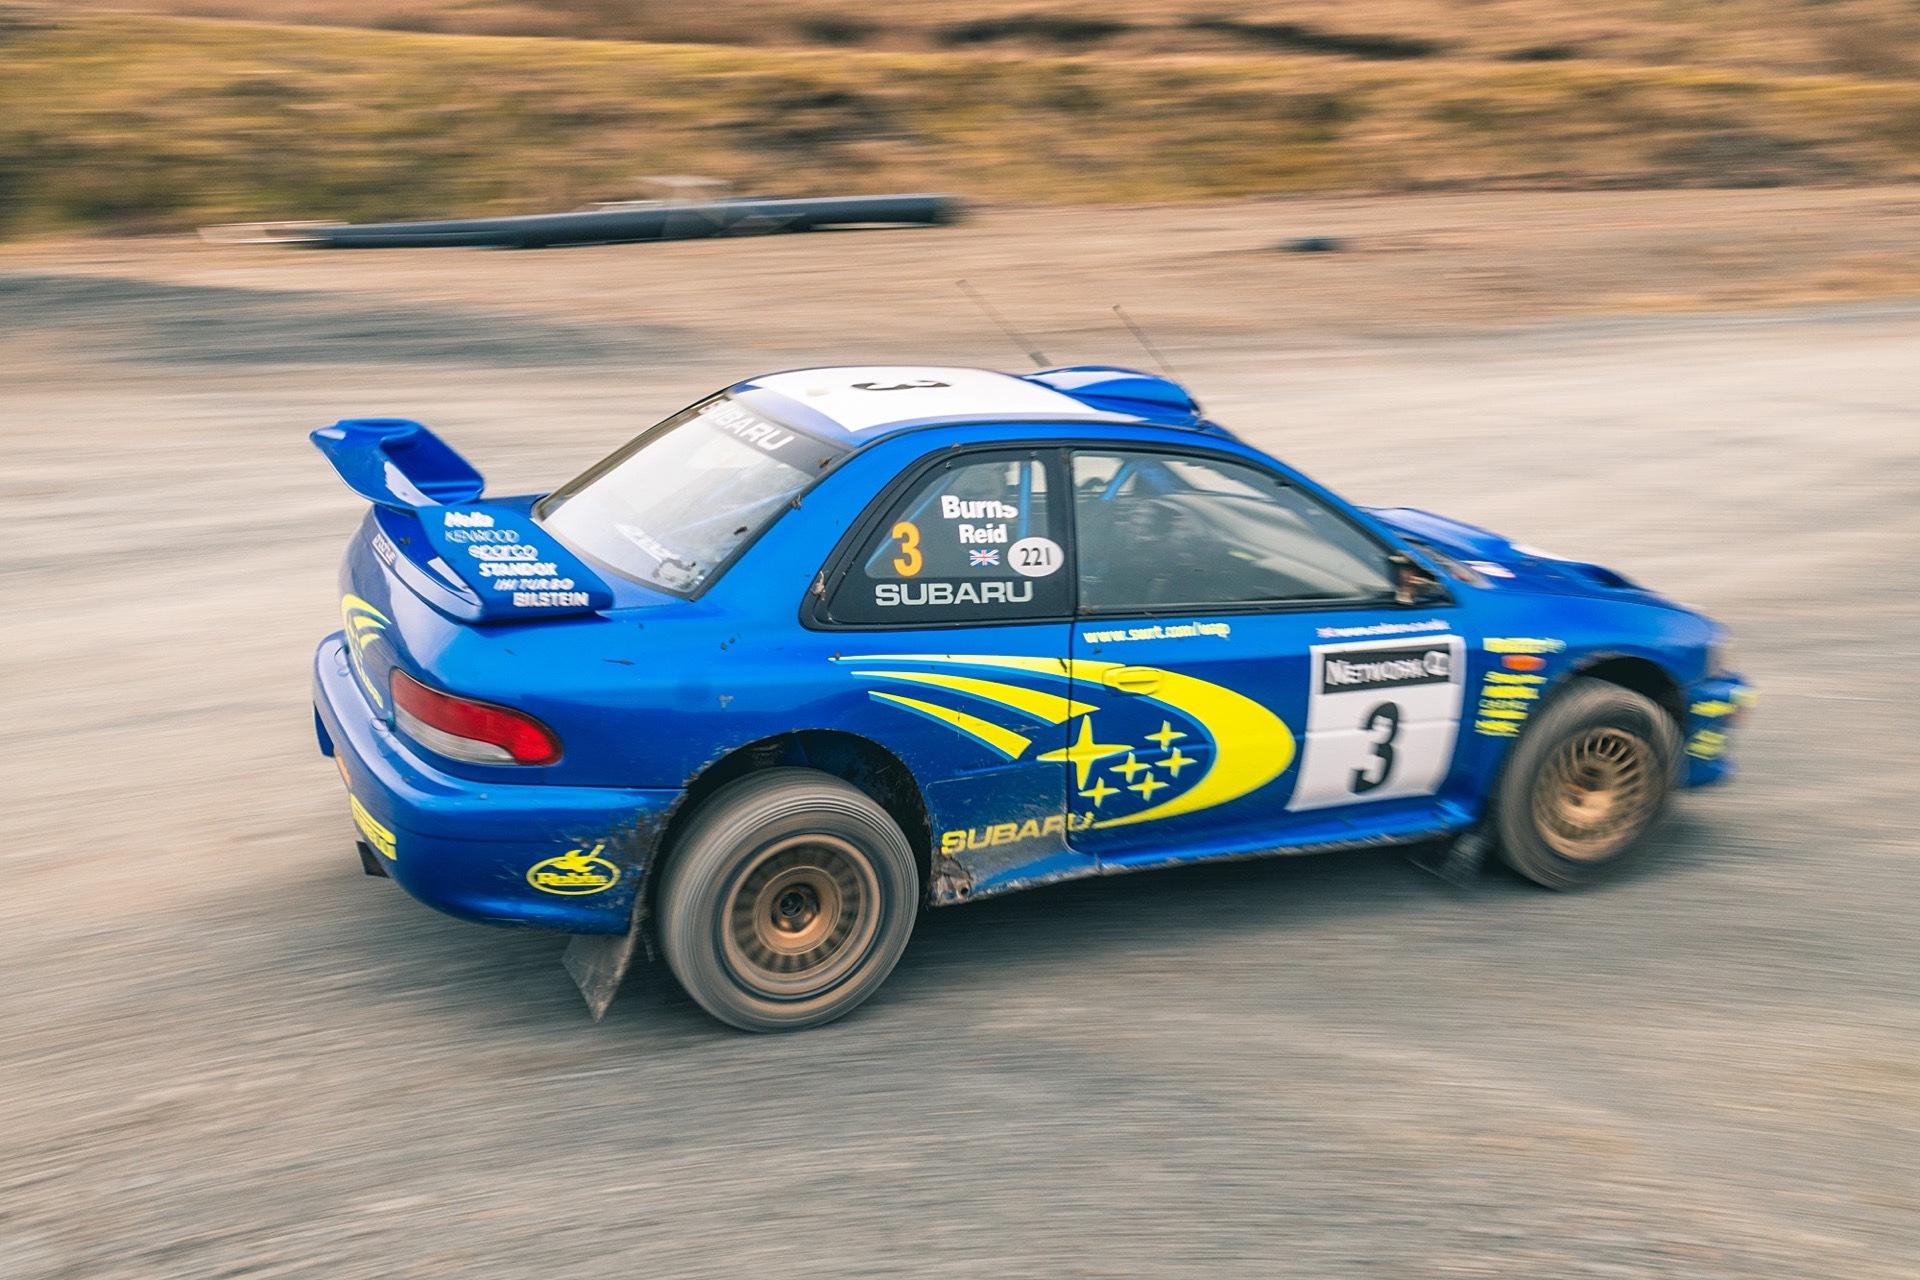 Richard_Burns_Subaru_Impreza_WRC_sale-0018